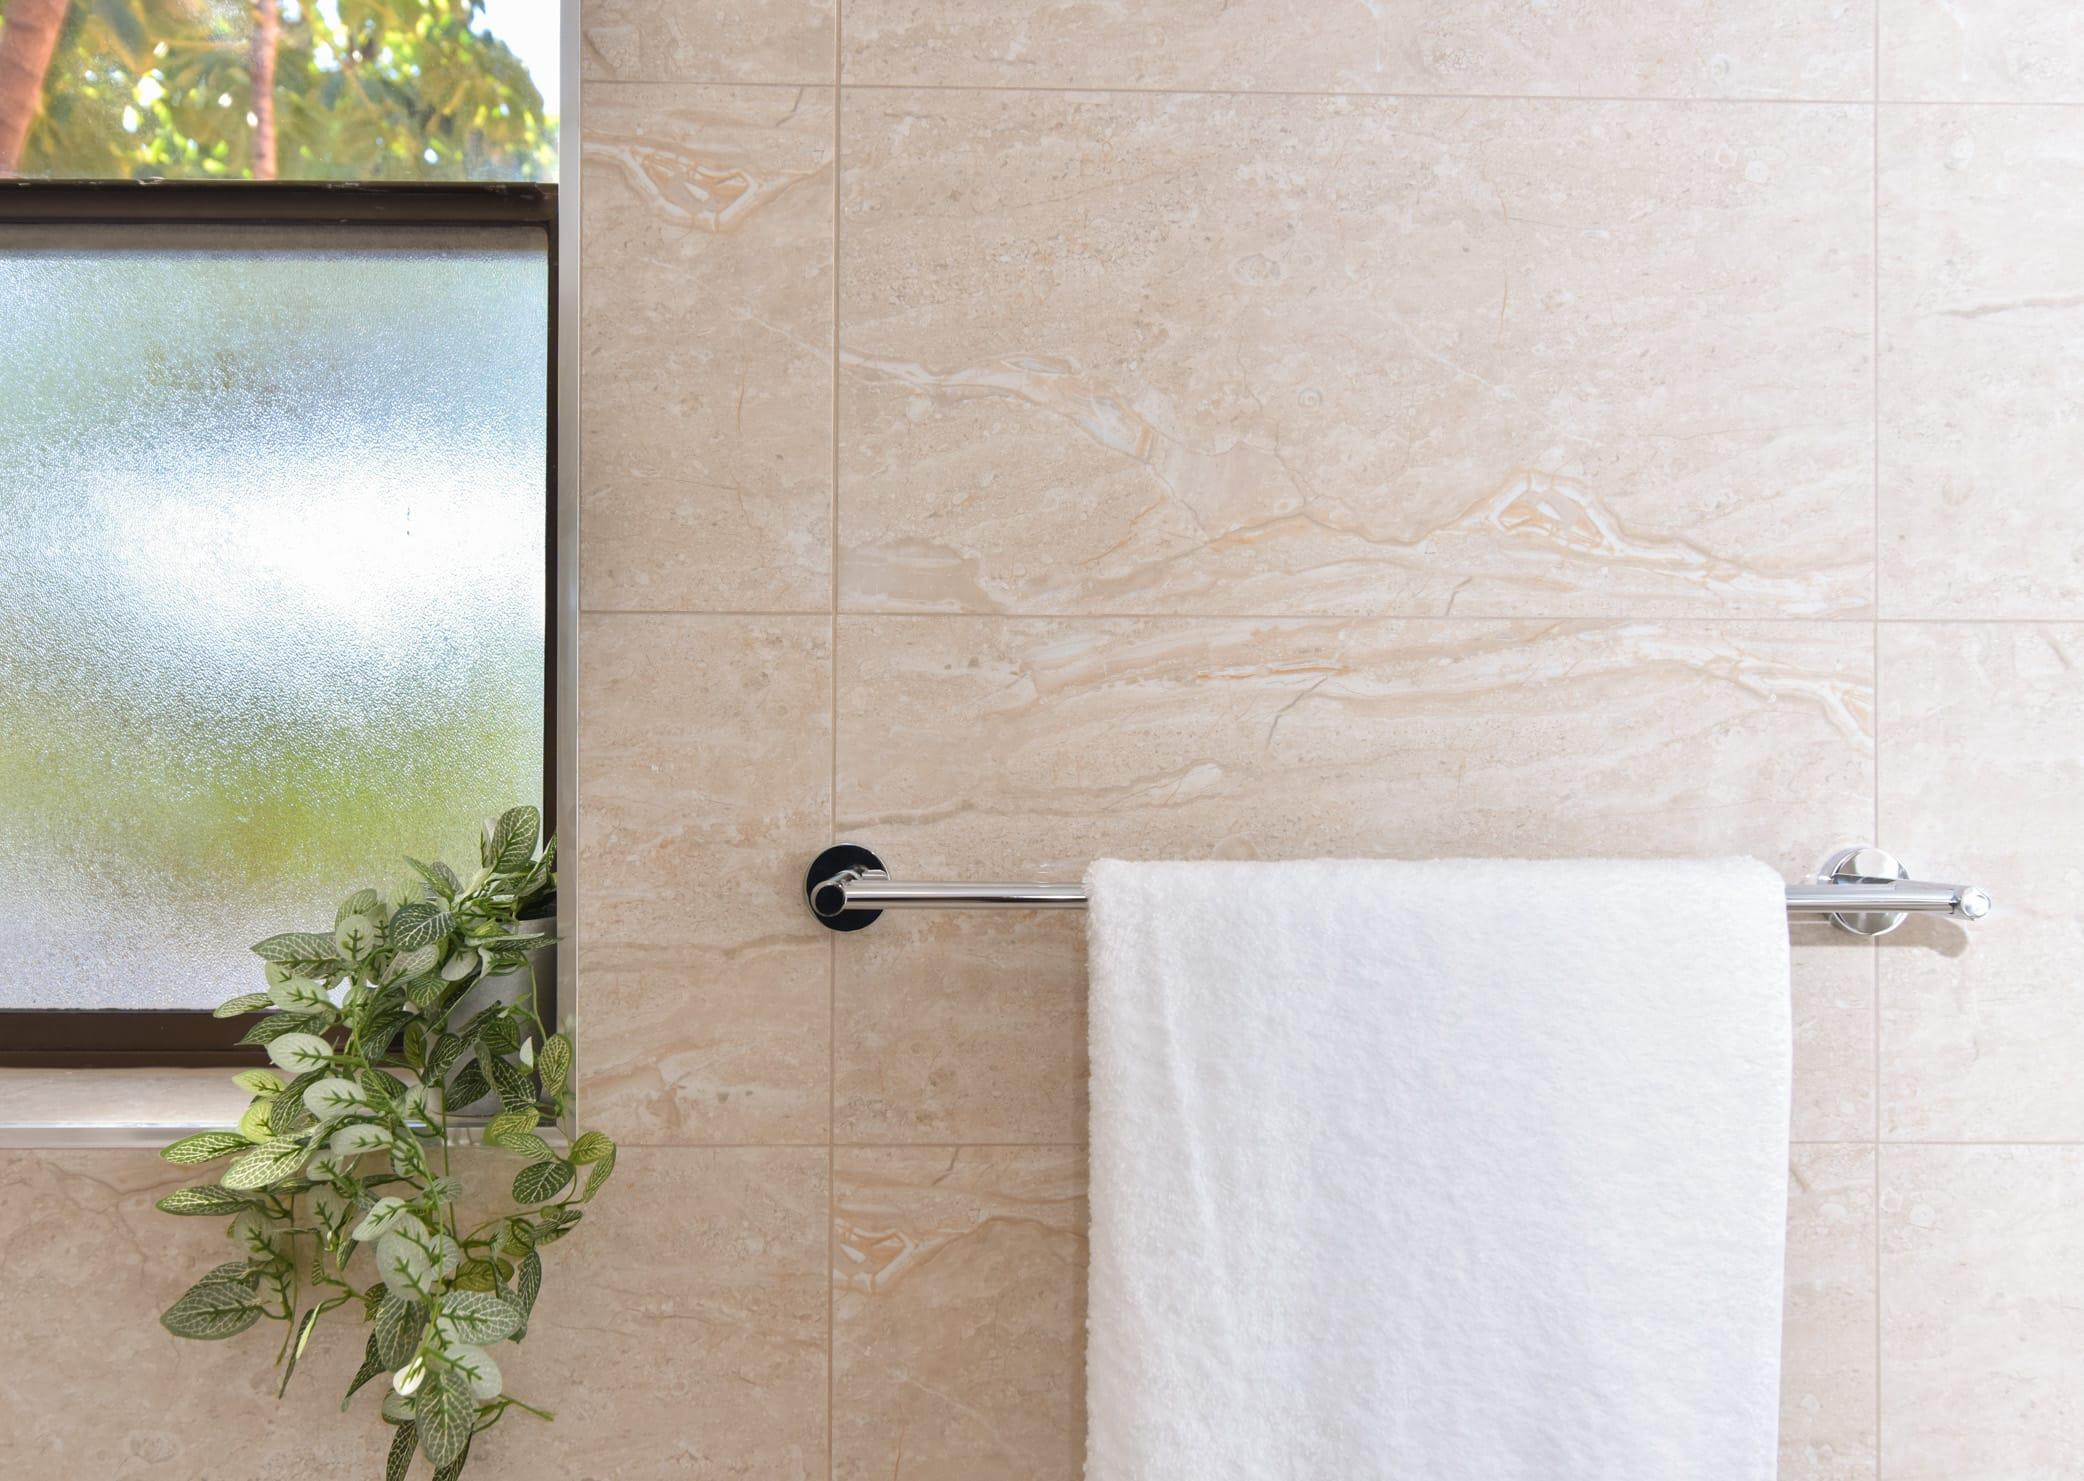 Bathrooms-38.jpg#asset:2405